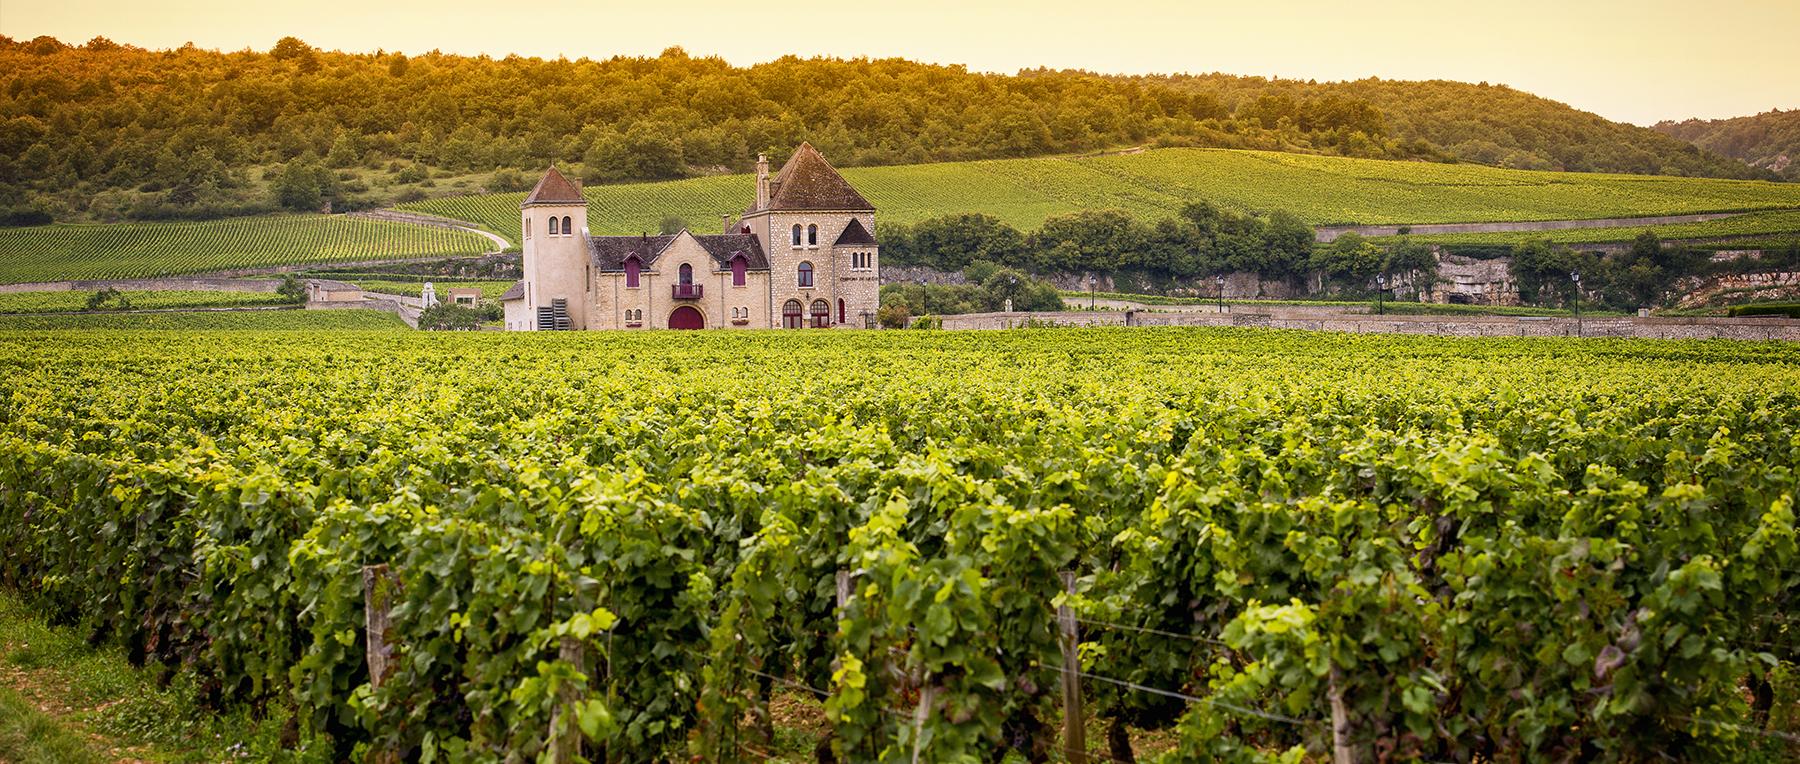 vin elegance fine wine importer france